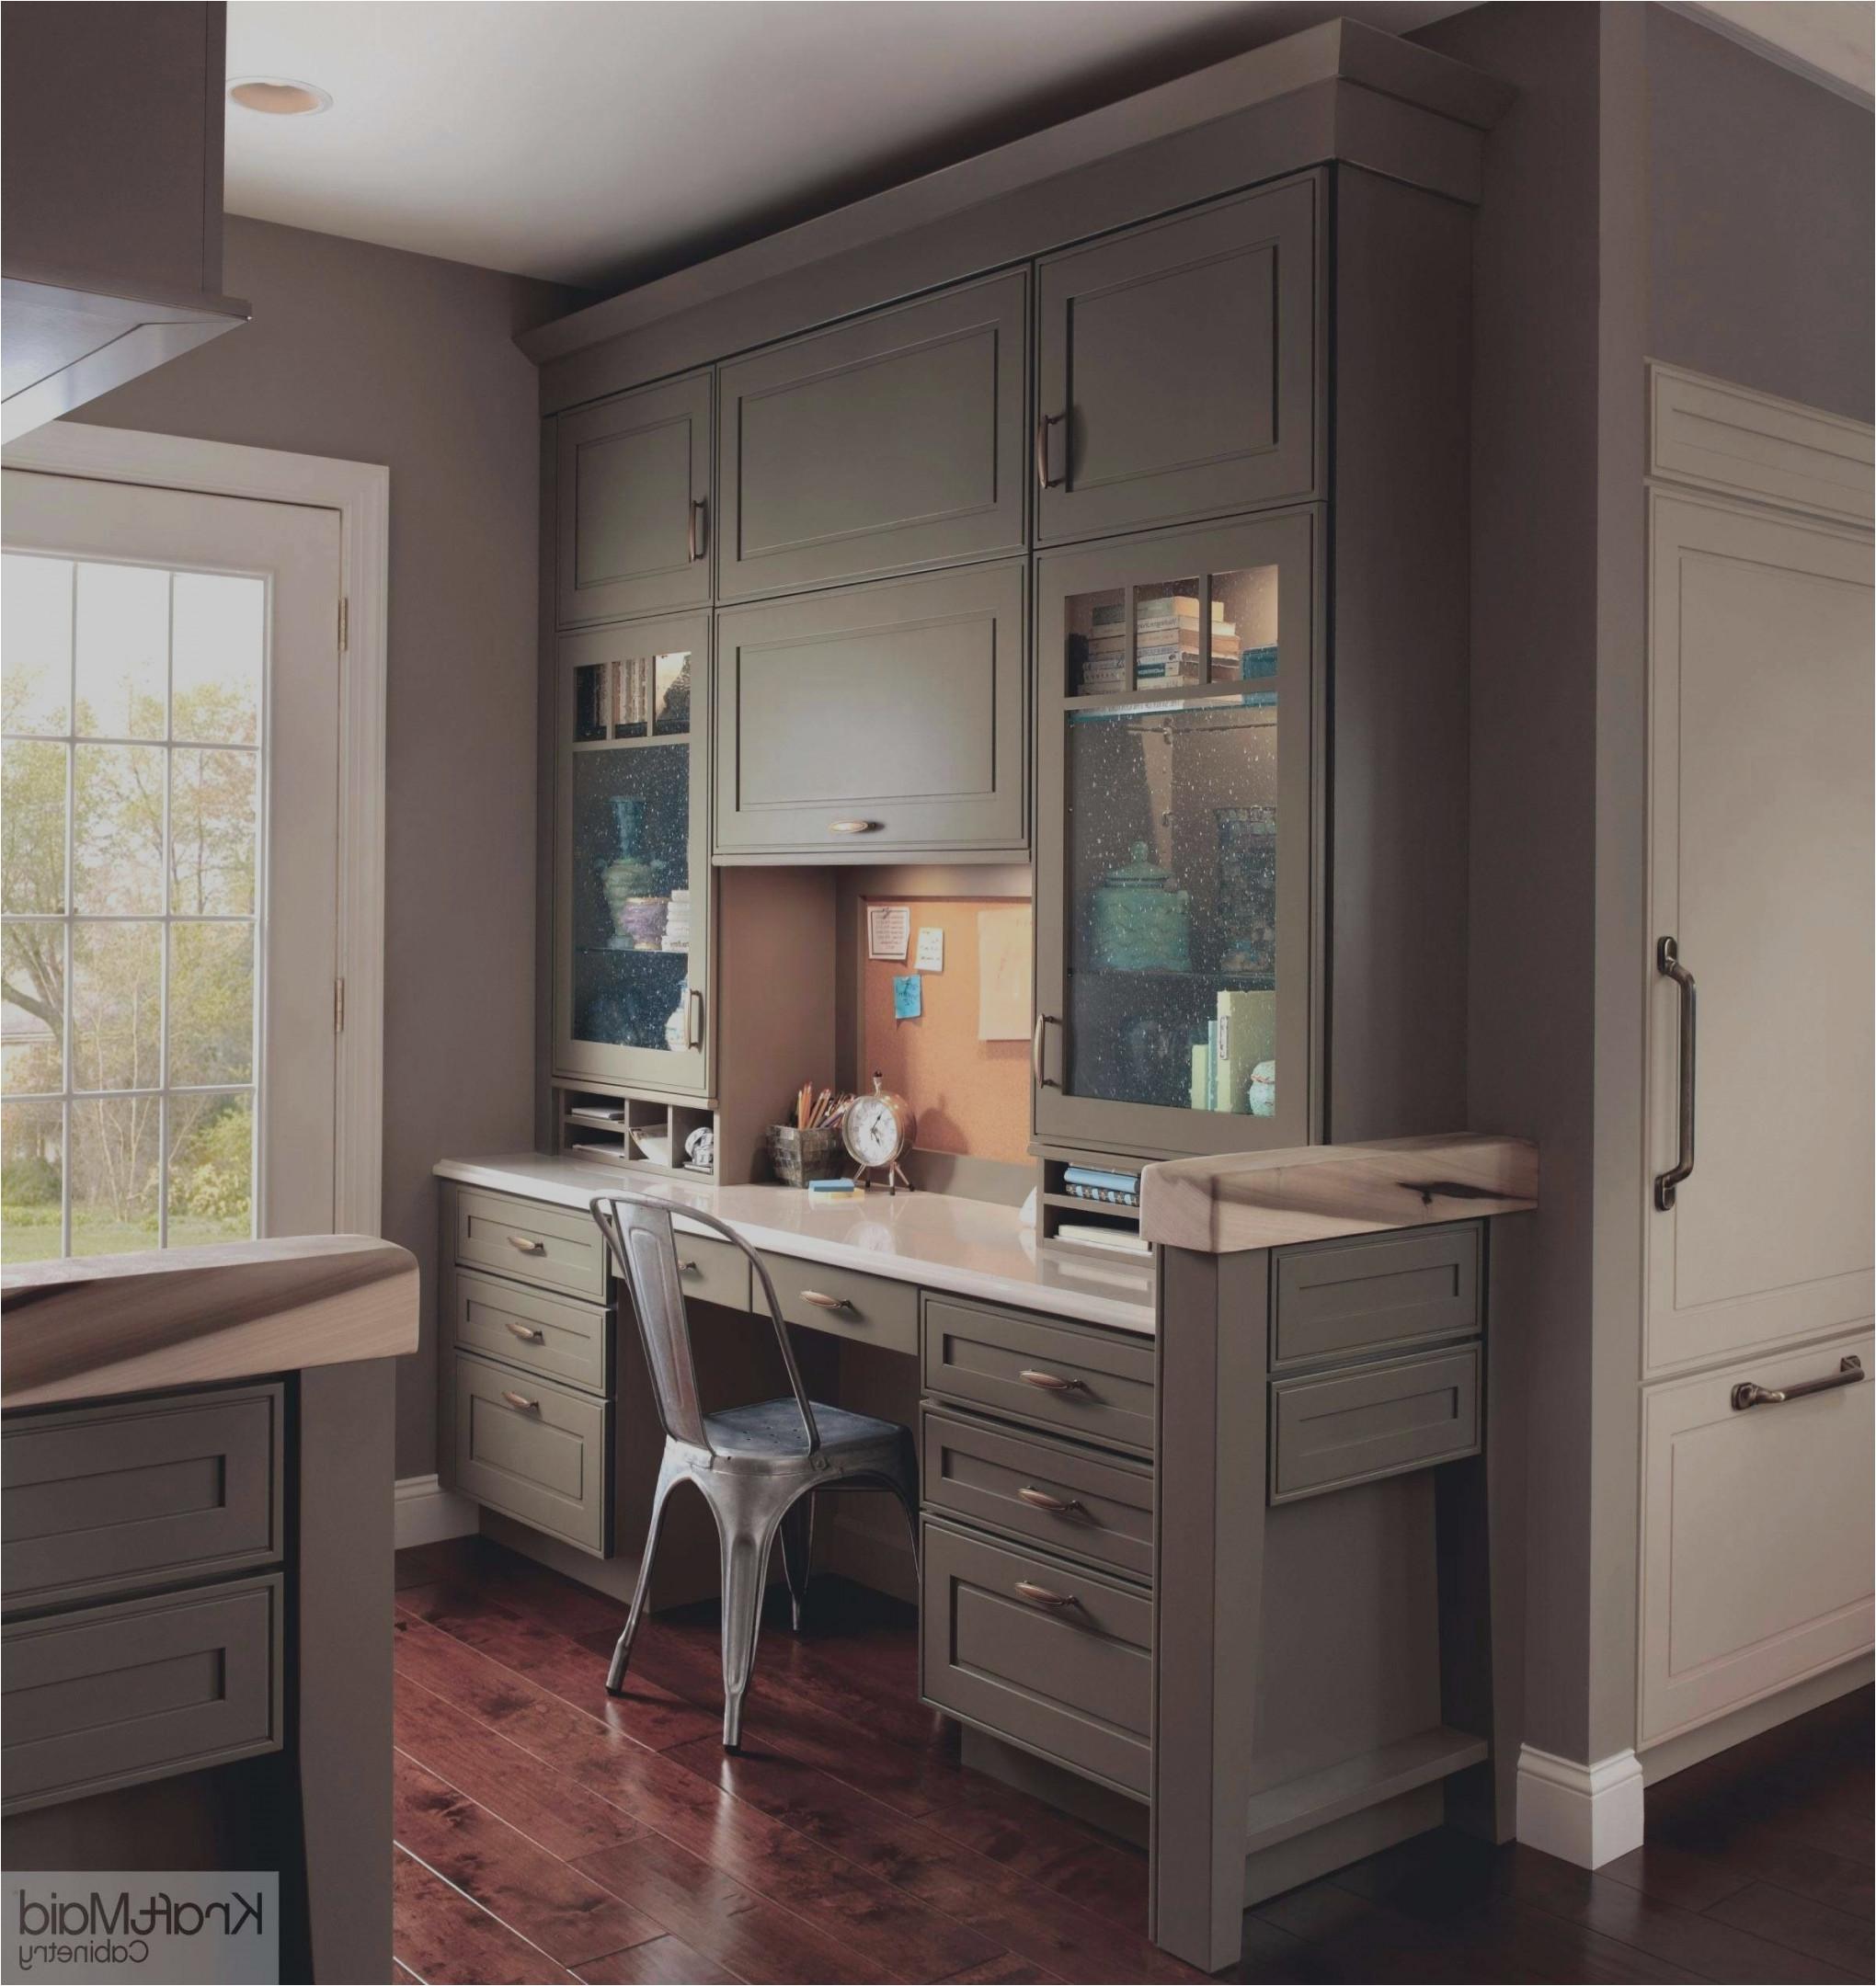 file cabinet metal rail insert best how to restain or paint kitchen cabinets kurtoglusanliurfa pickled maple kitchen cabinets awesome kitchen cabinet 0d